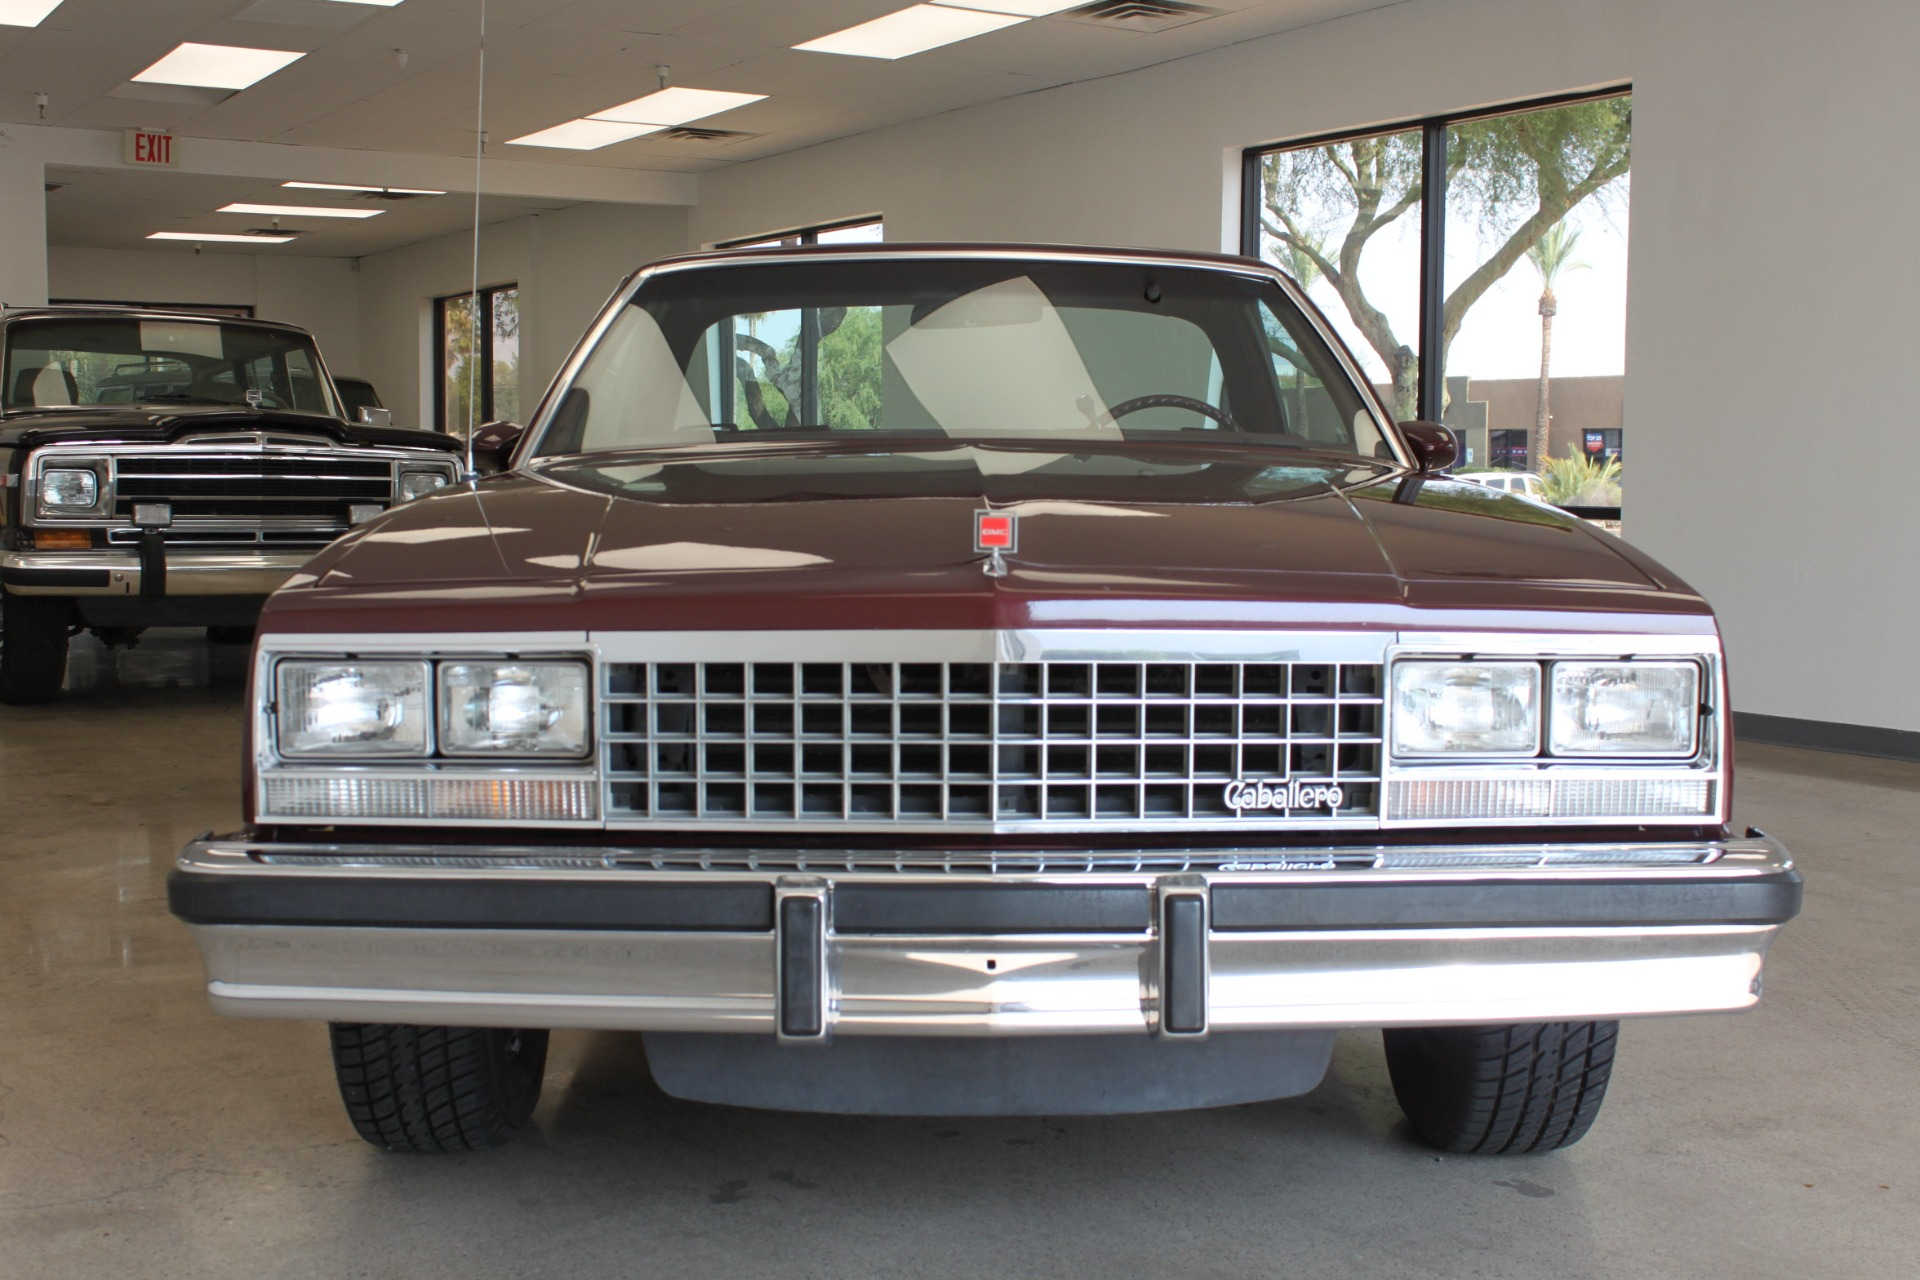 Used-1984-GMC-Caballero-Wrangler